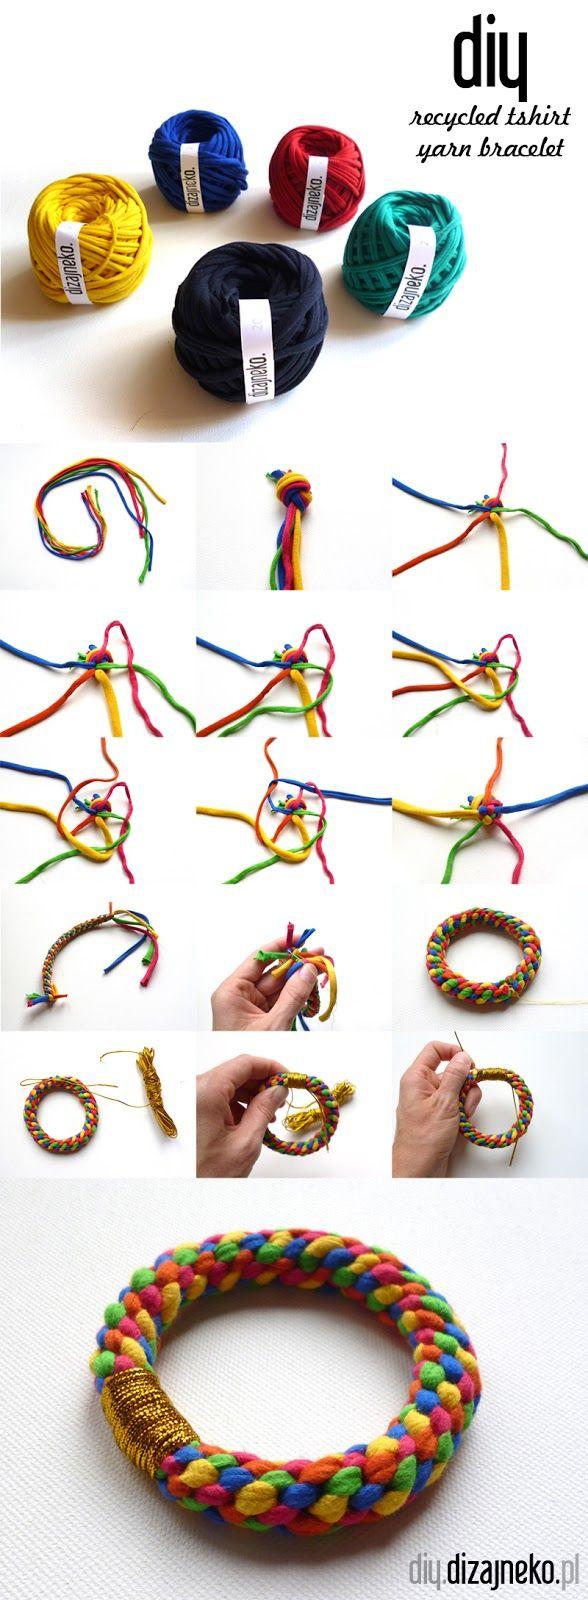 recycled tshirt yarn bracelet